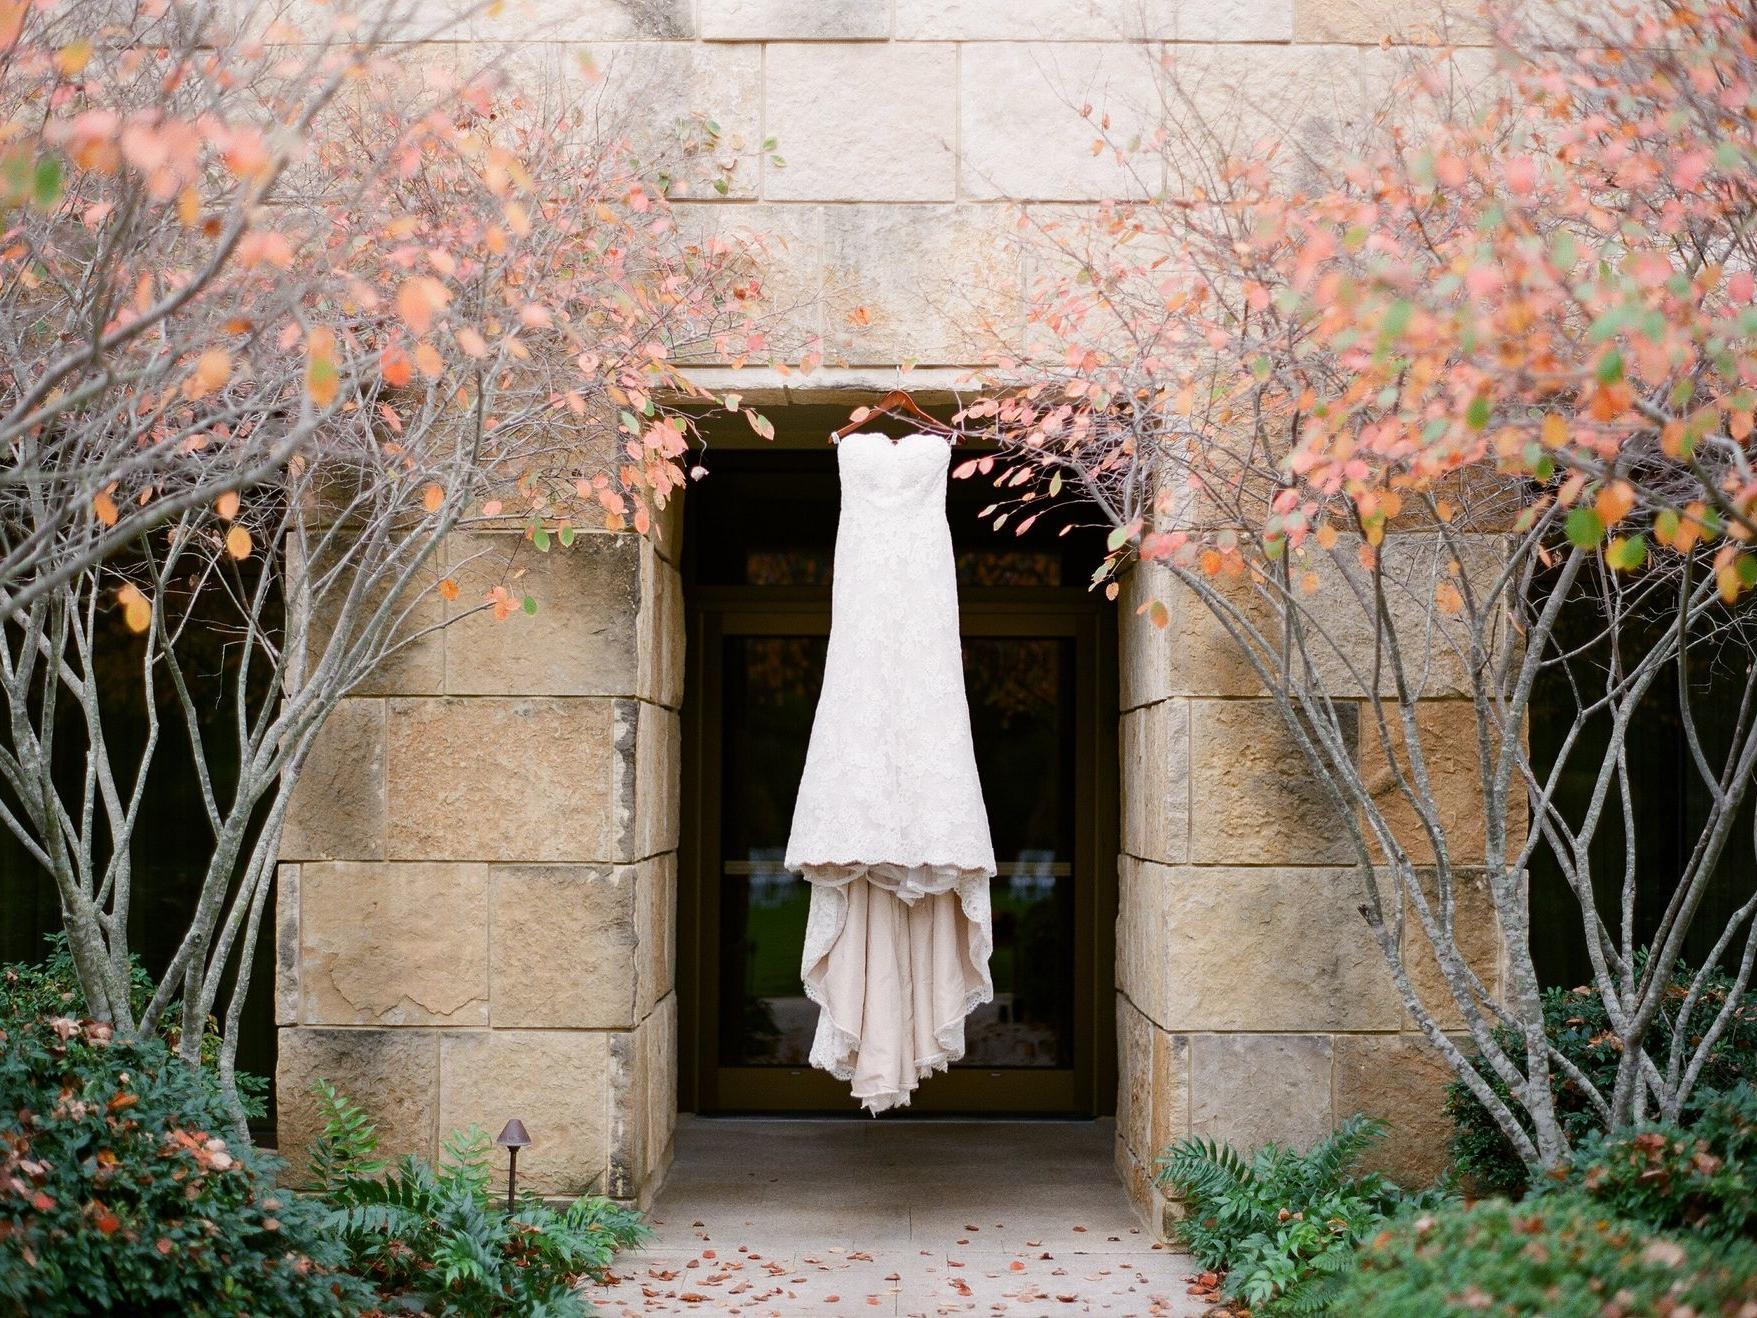 Hanging Wedding Dress outdoors - Almond Leaf Studio